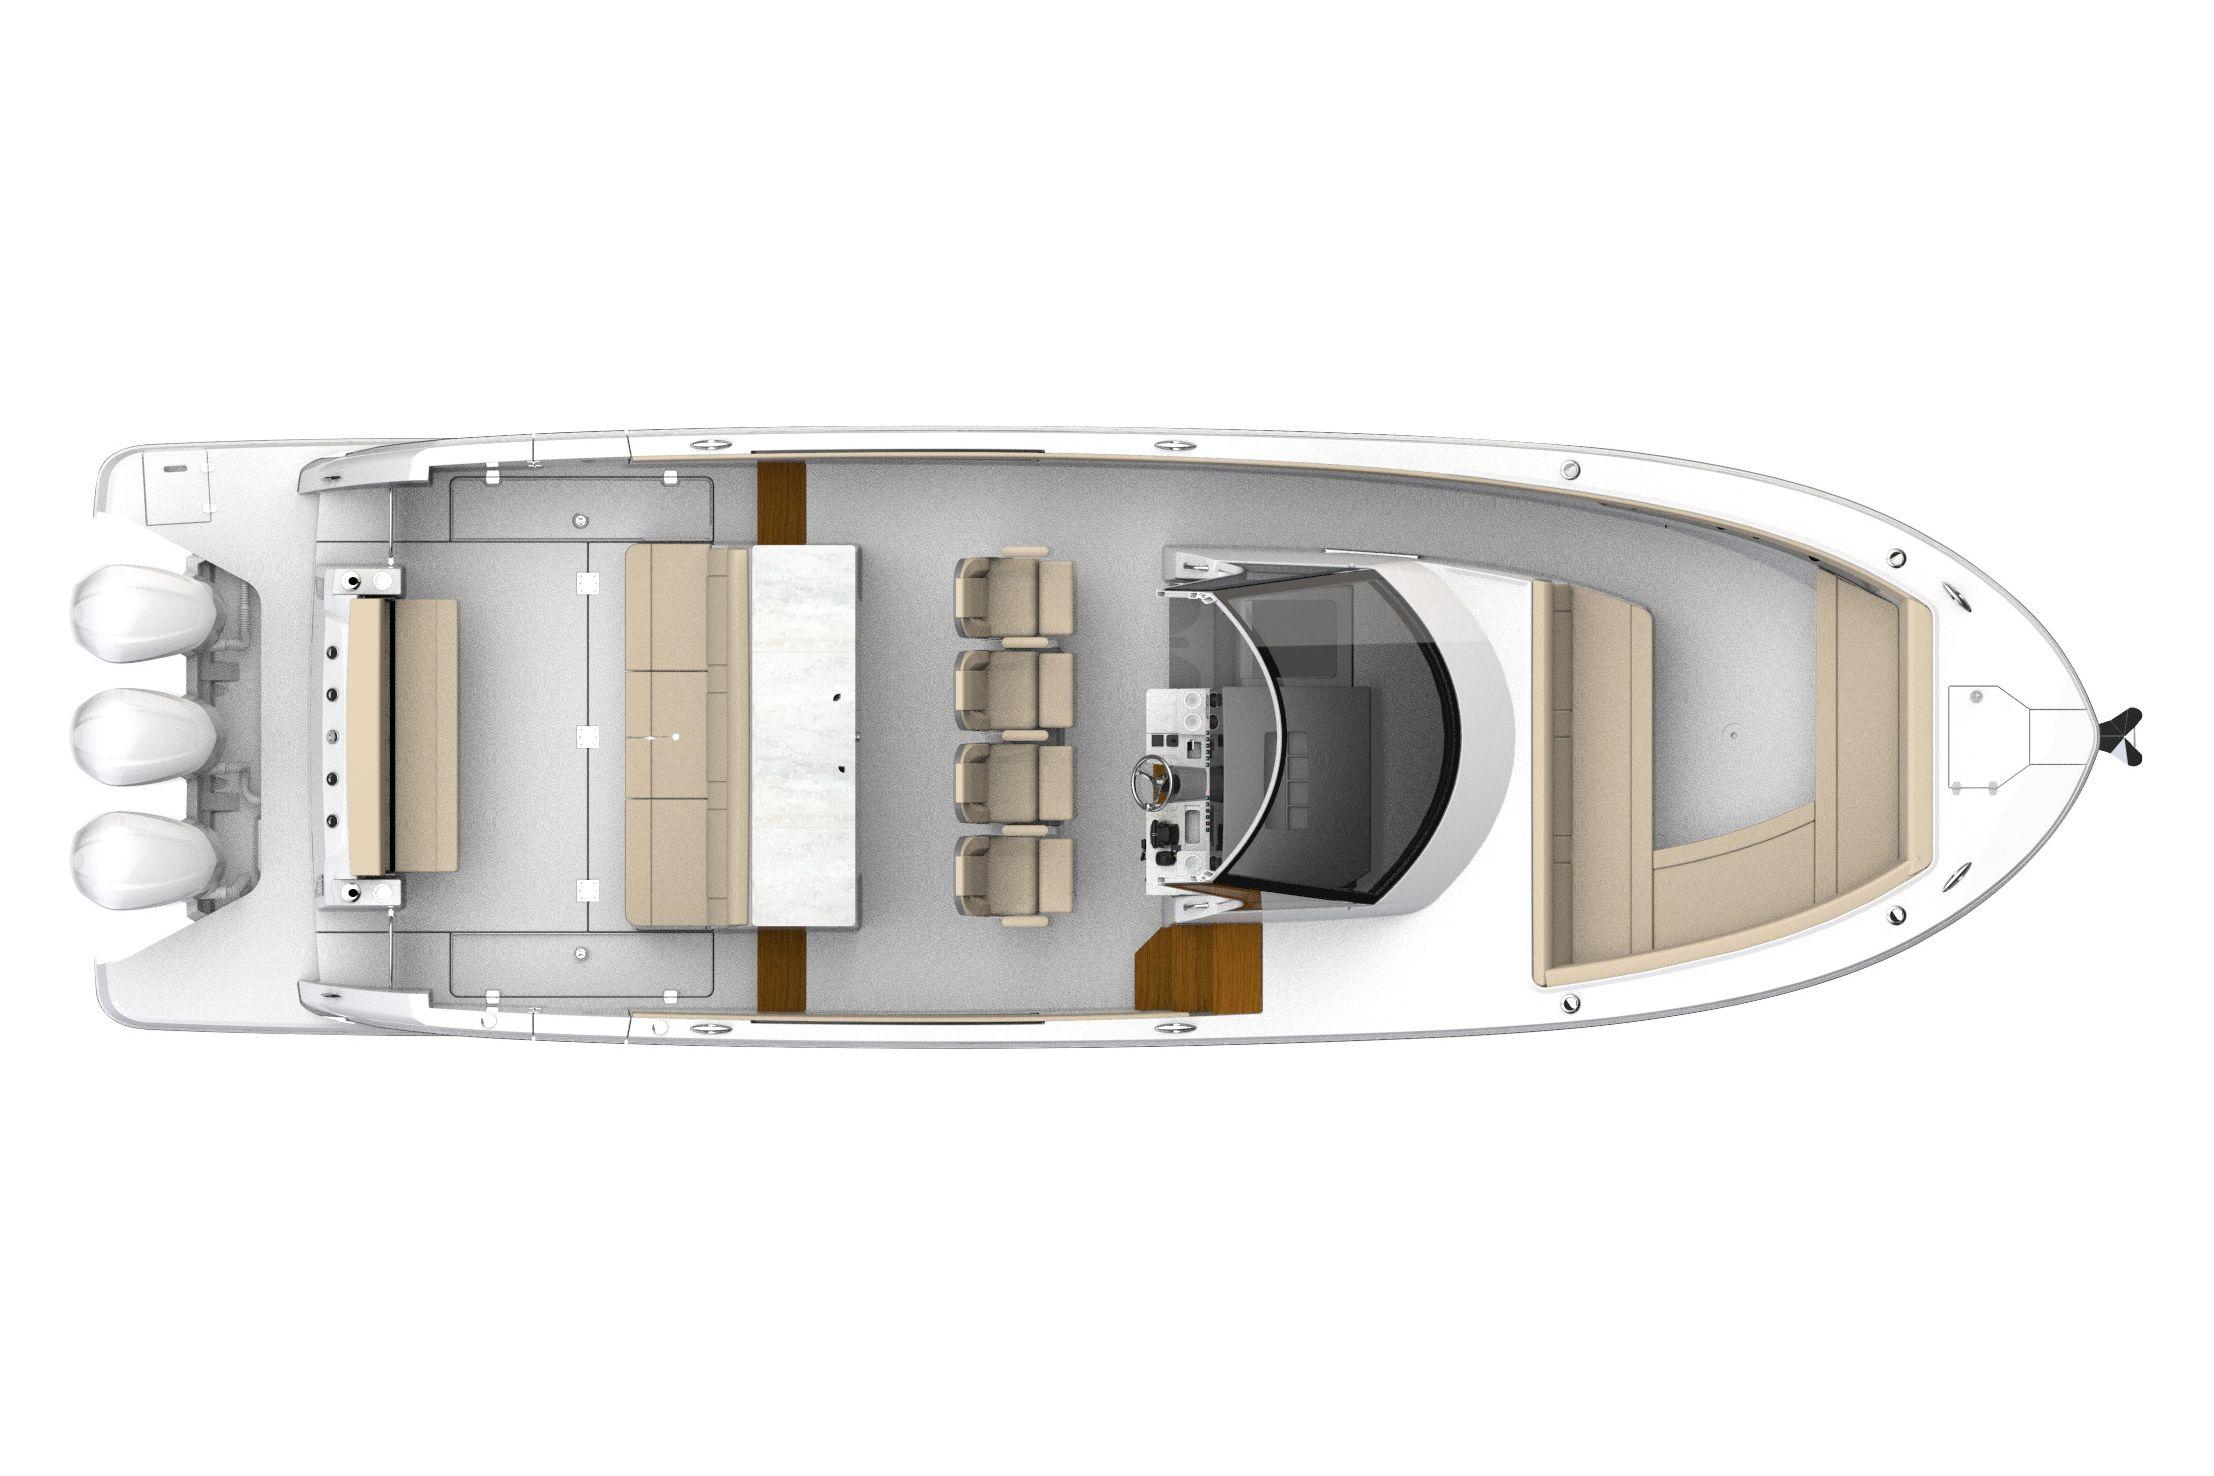 38sav_overhead-Cockpit